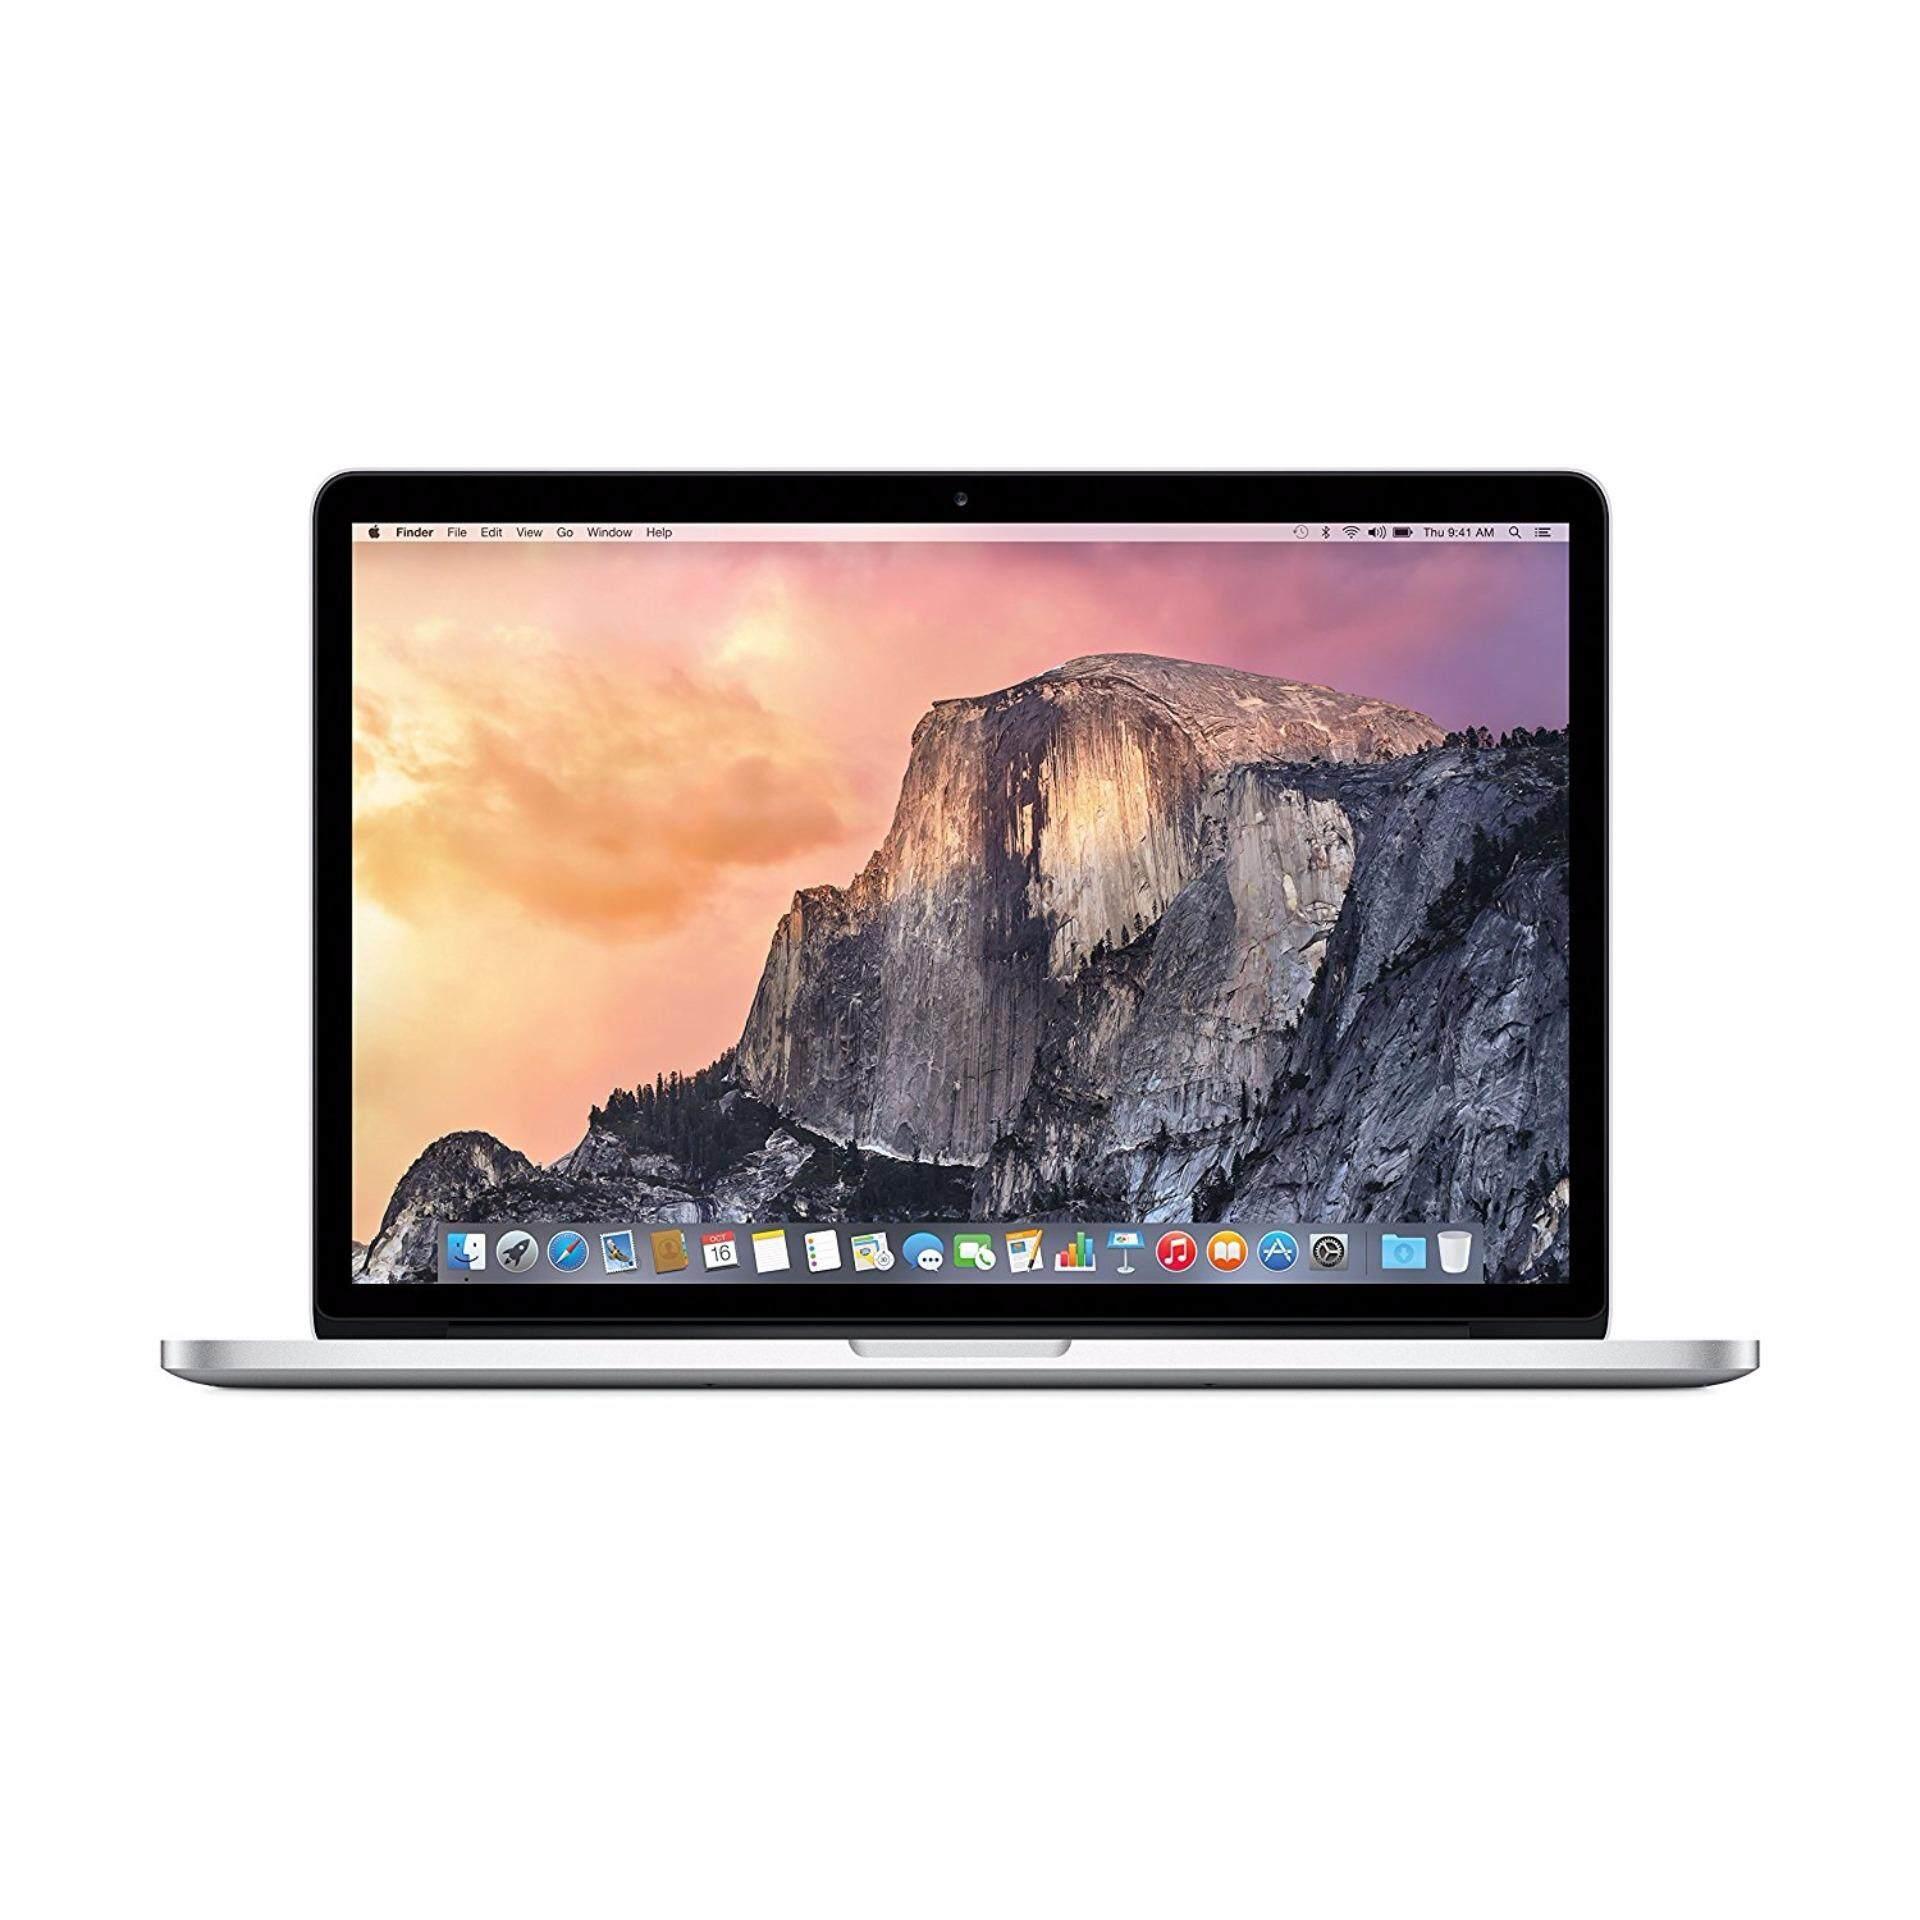 Apple MacBook Pro 15 Laptop 256GB MJLQ2LL/A  (May, 2015, Silver) Malaysia